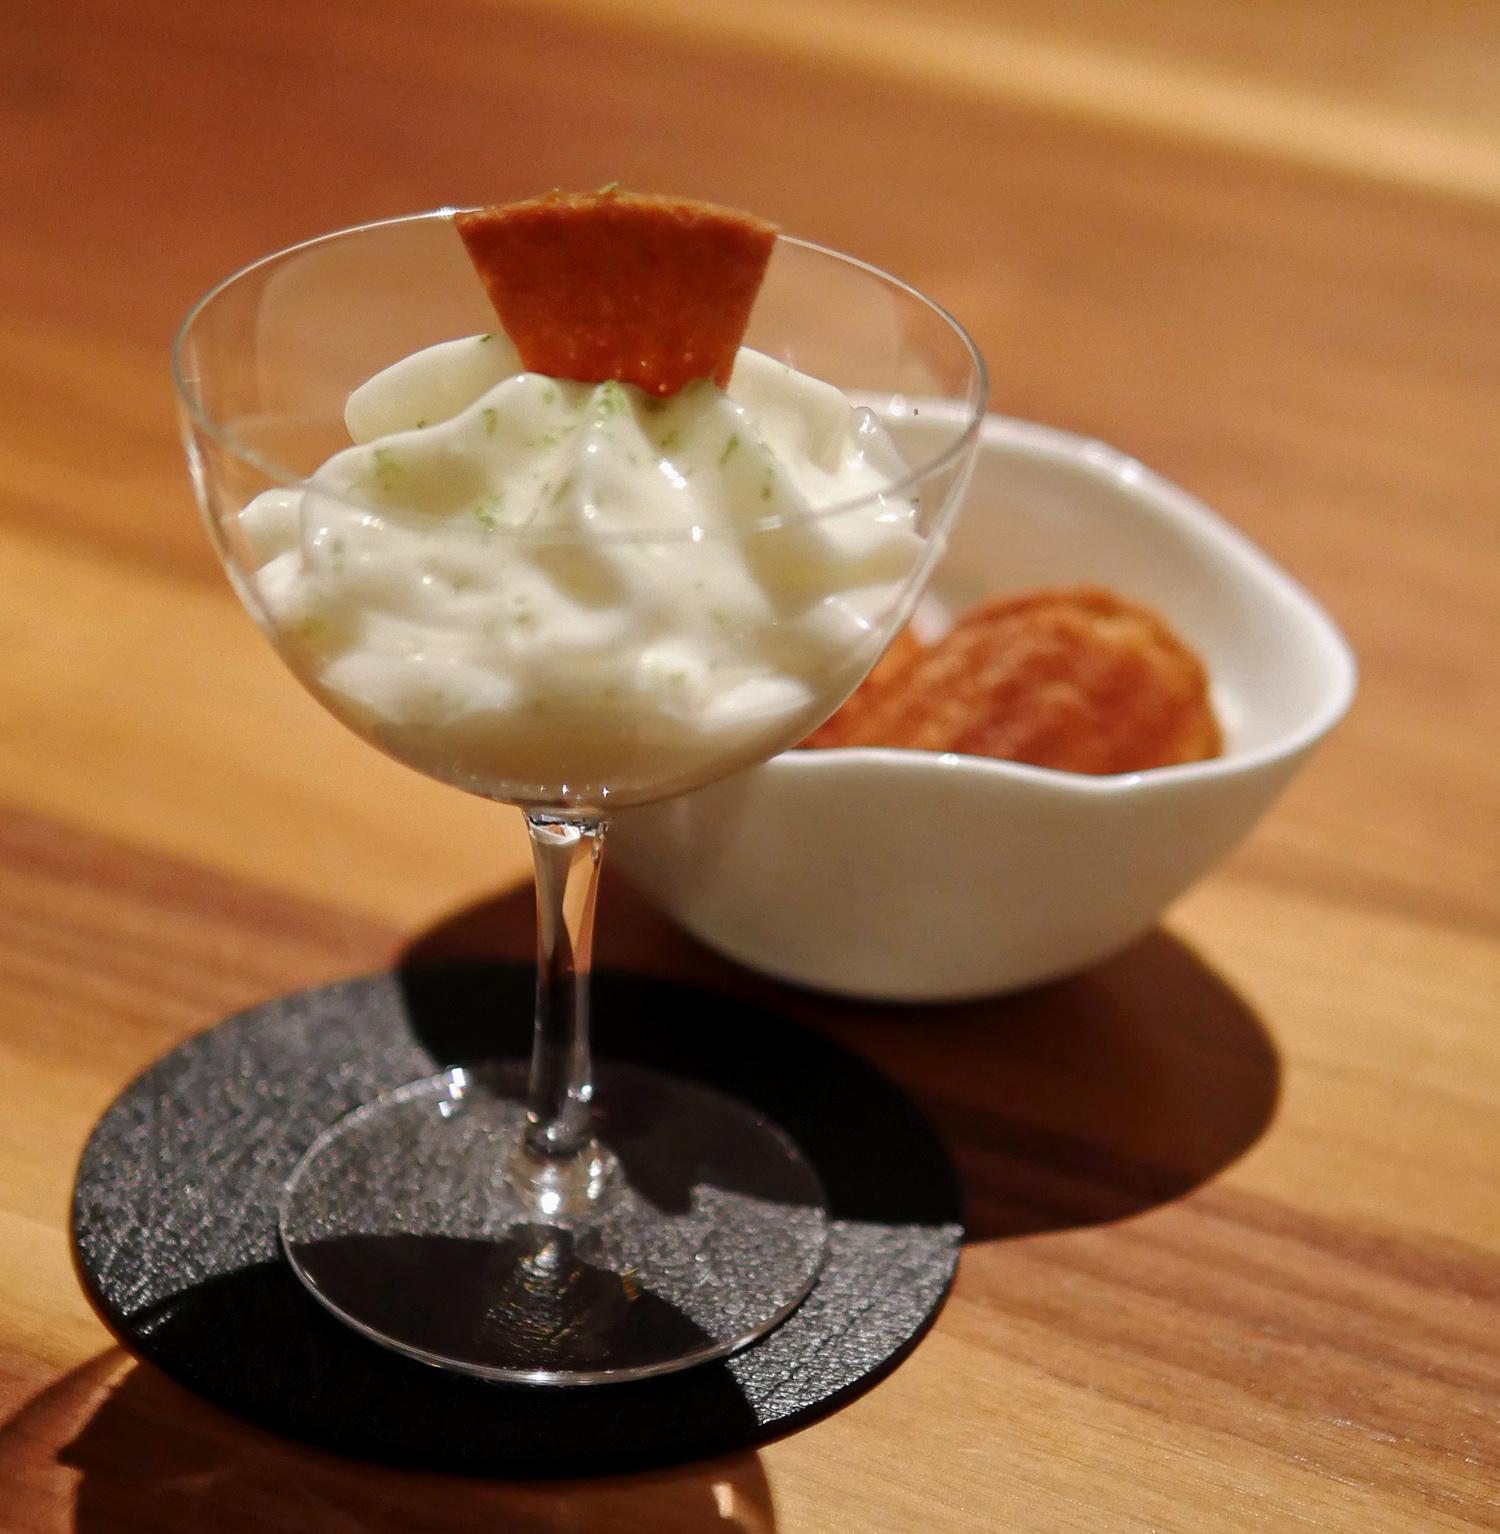 The Clove Club - Amalfi Lemonade and Kampot White Pepper Ice Cream